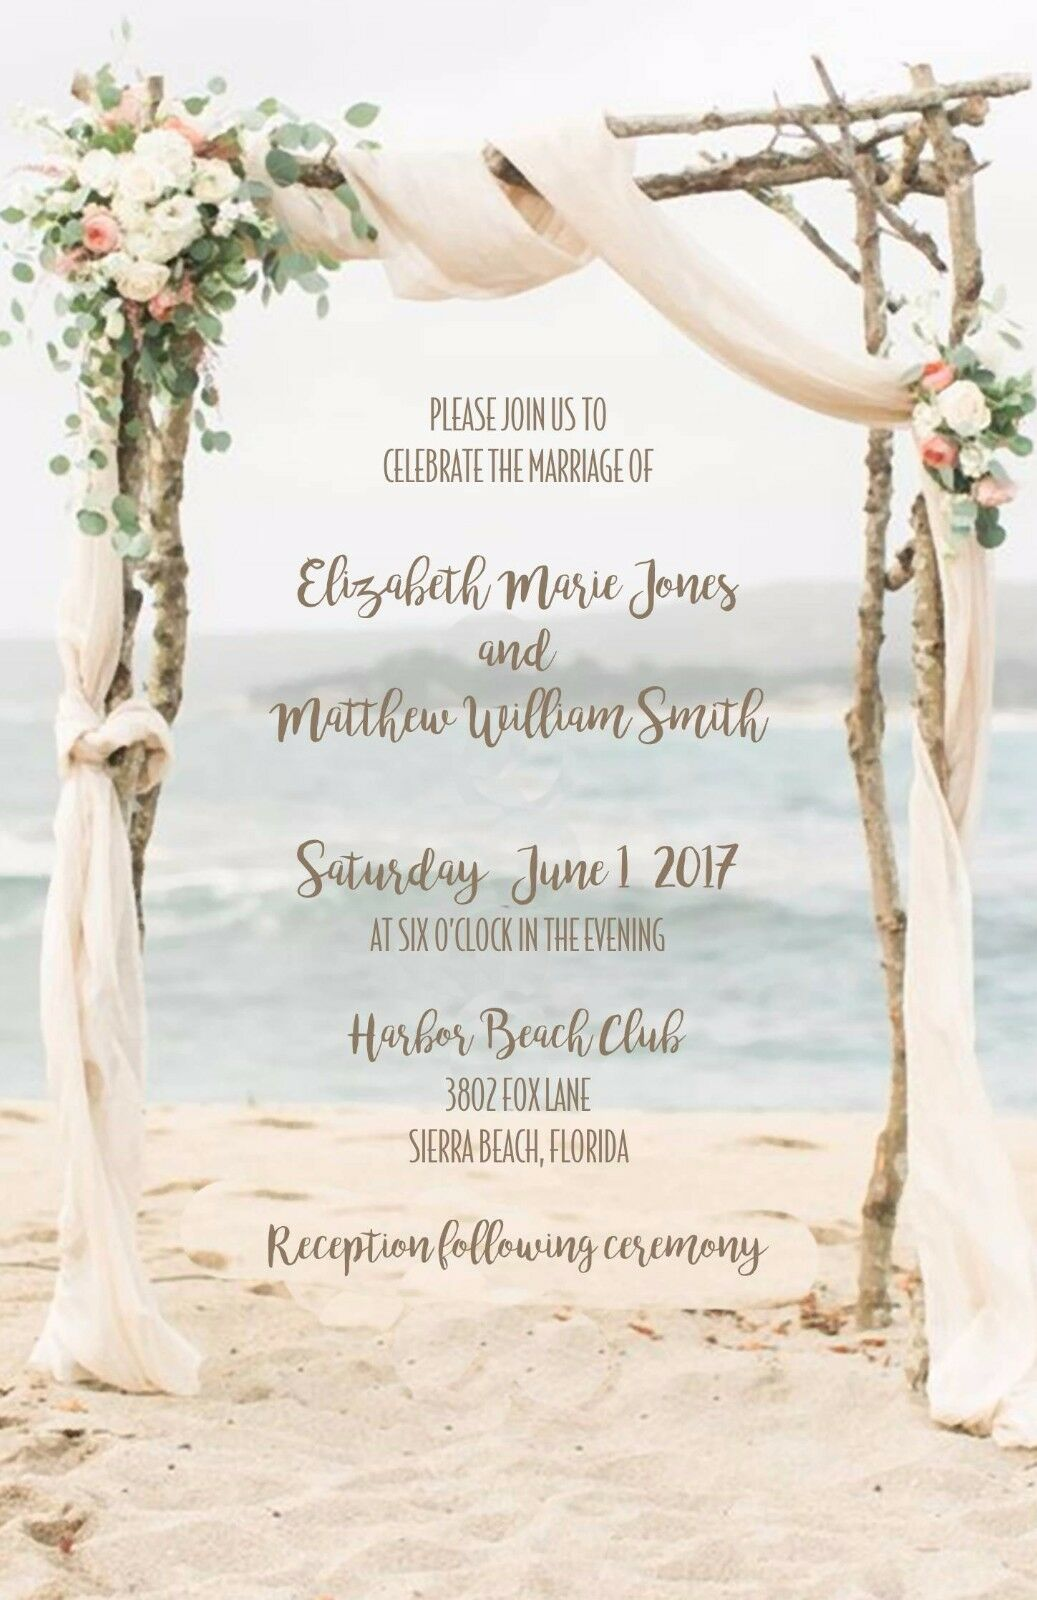 Wedding Invitations Beach Arbor Beach Destination Wedding 50 Invitations & RSVP